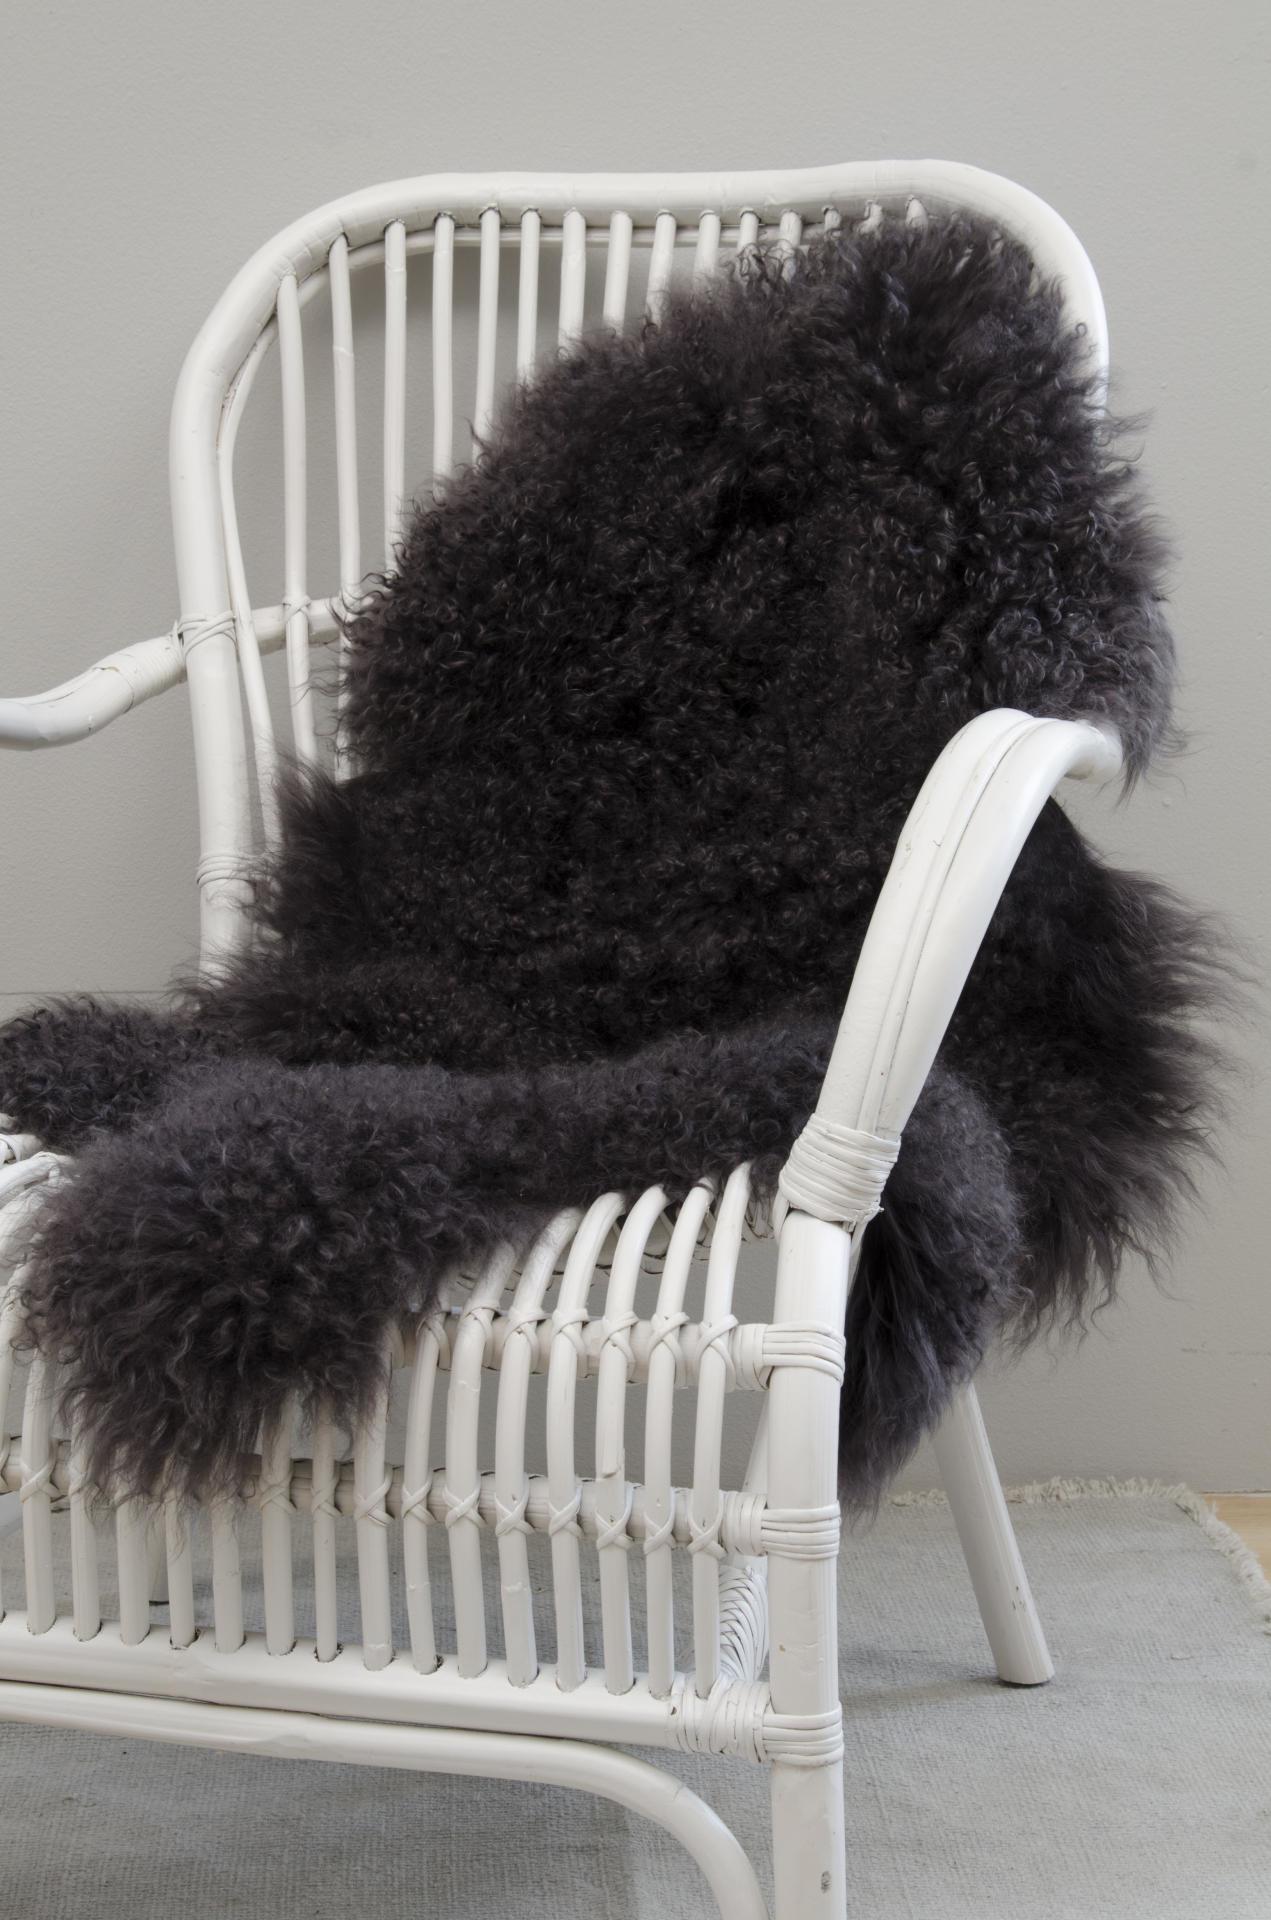 IB LAURSEN Tibetská ovčí kožešina Dark grey, šedá barva, kožešina Šedá